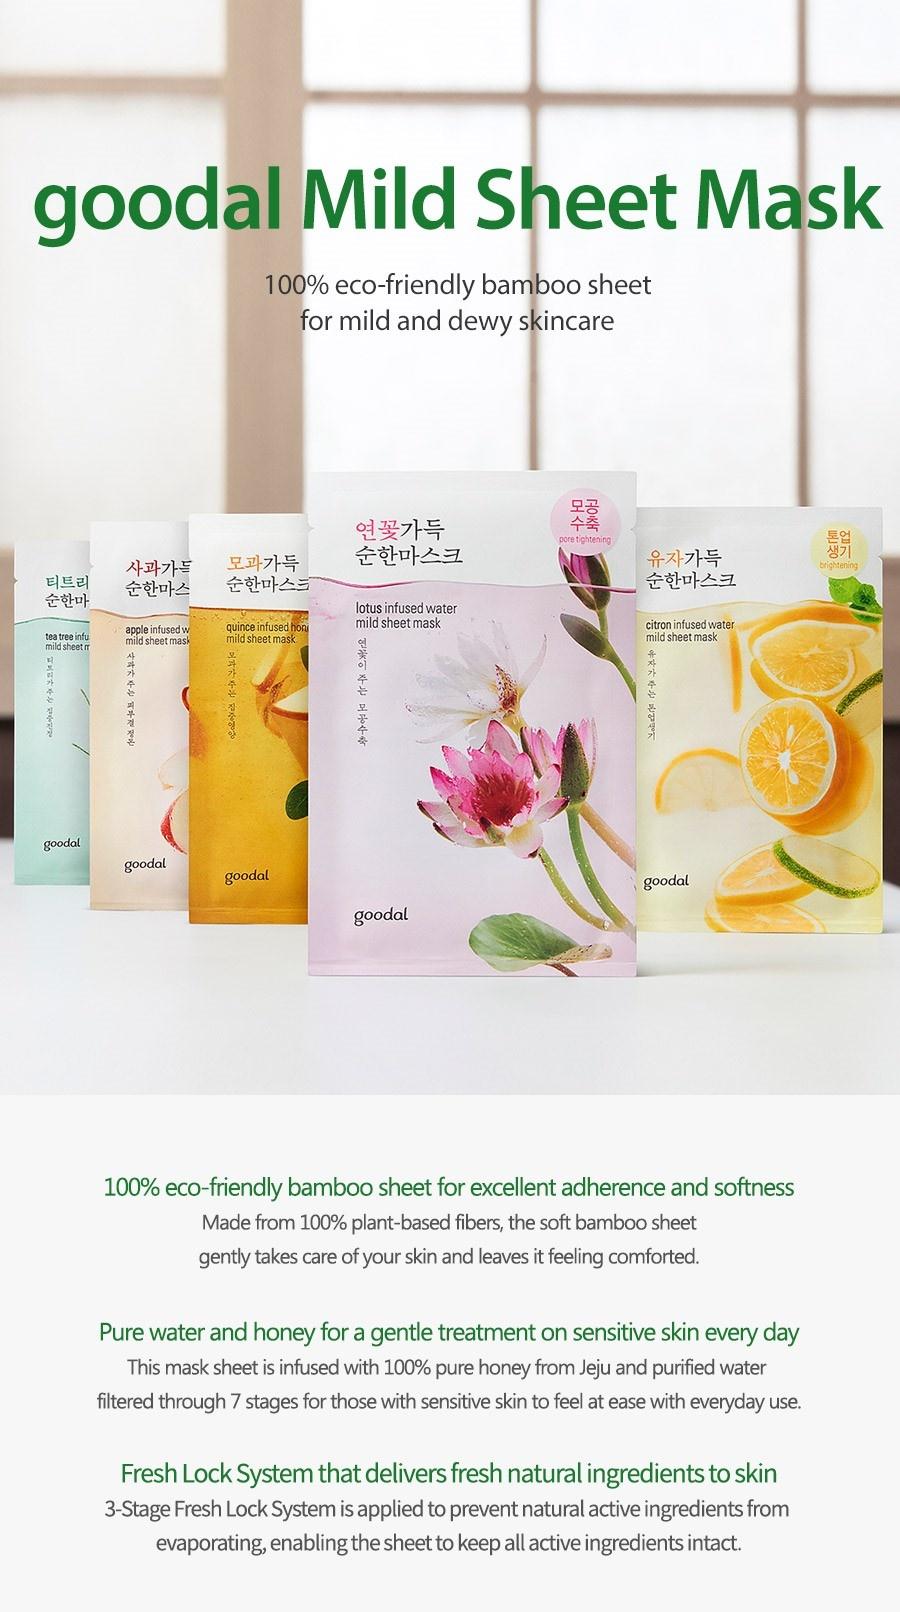 greentea infused water mild sheet mask-2